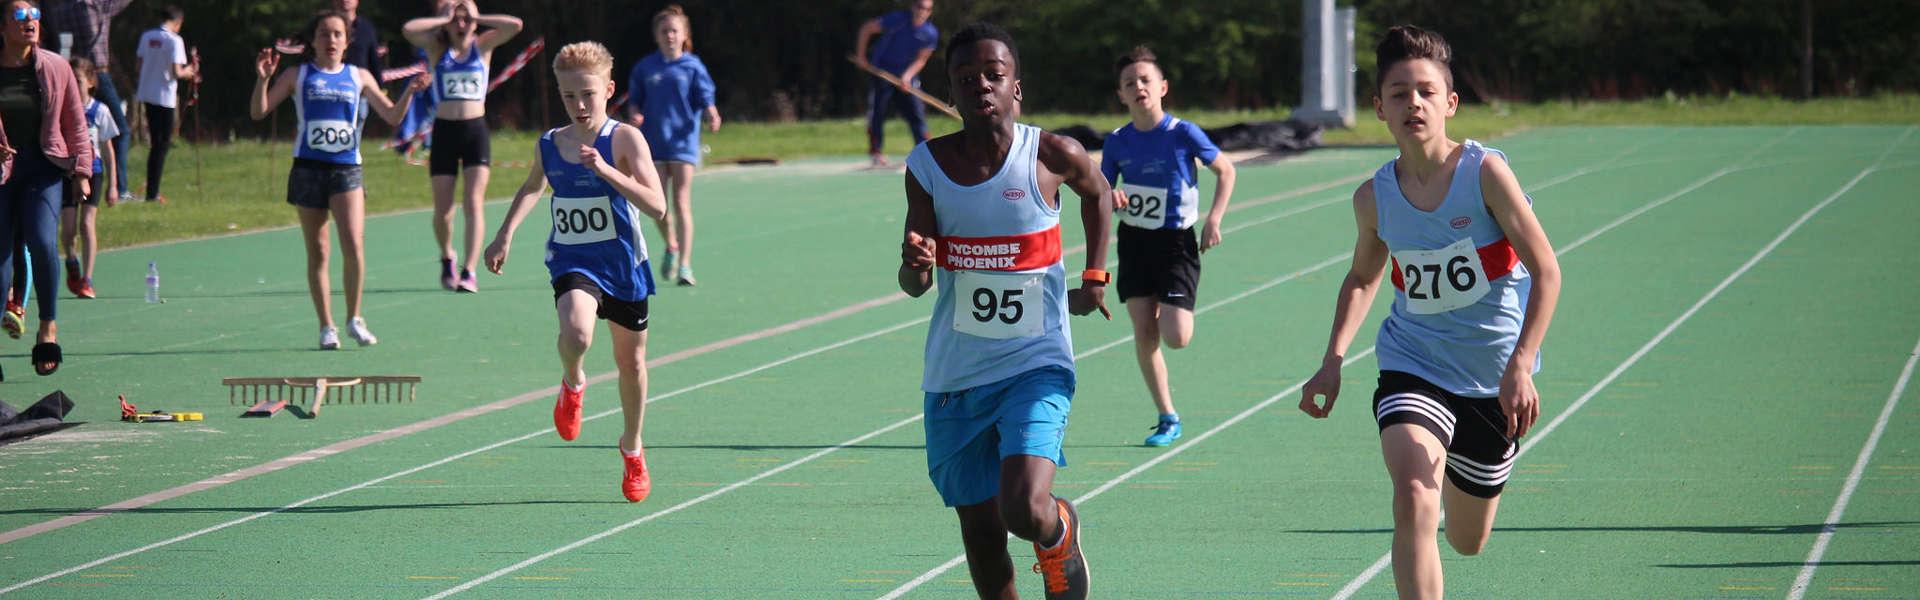 1500m run